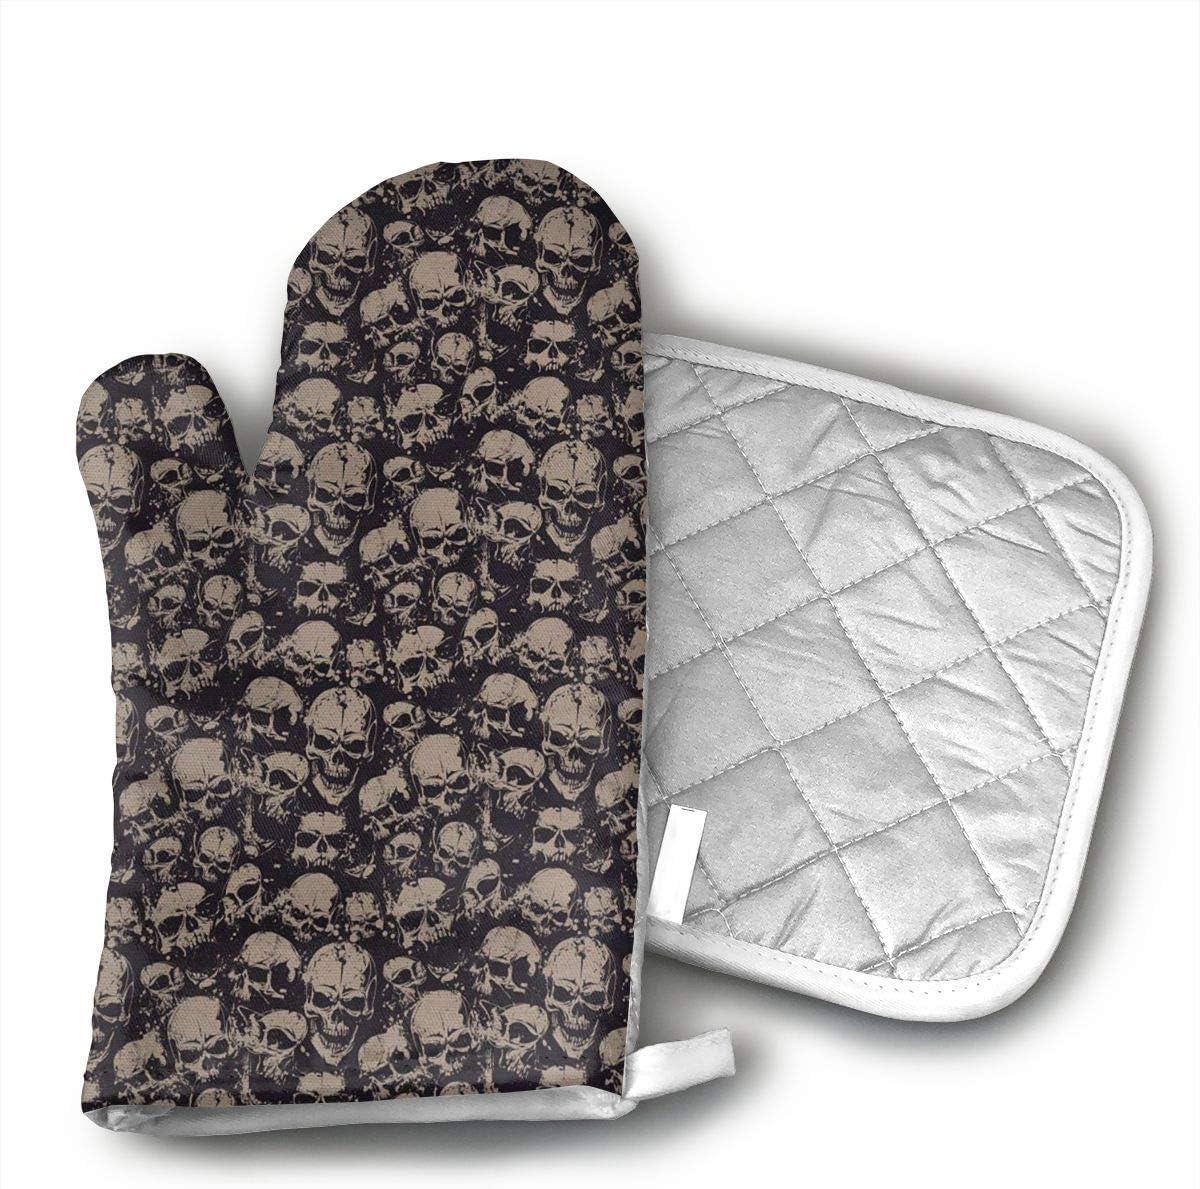 EROJfj Horrible Skeleton Horror Theme Oven Mitts and Potholders BBQ Gloves-Oven Mitts and Pot Holders Non-Slip Cooking Gloves for Cooking Baking Grilling